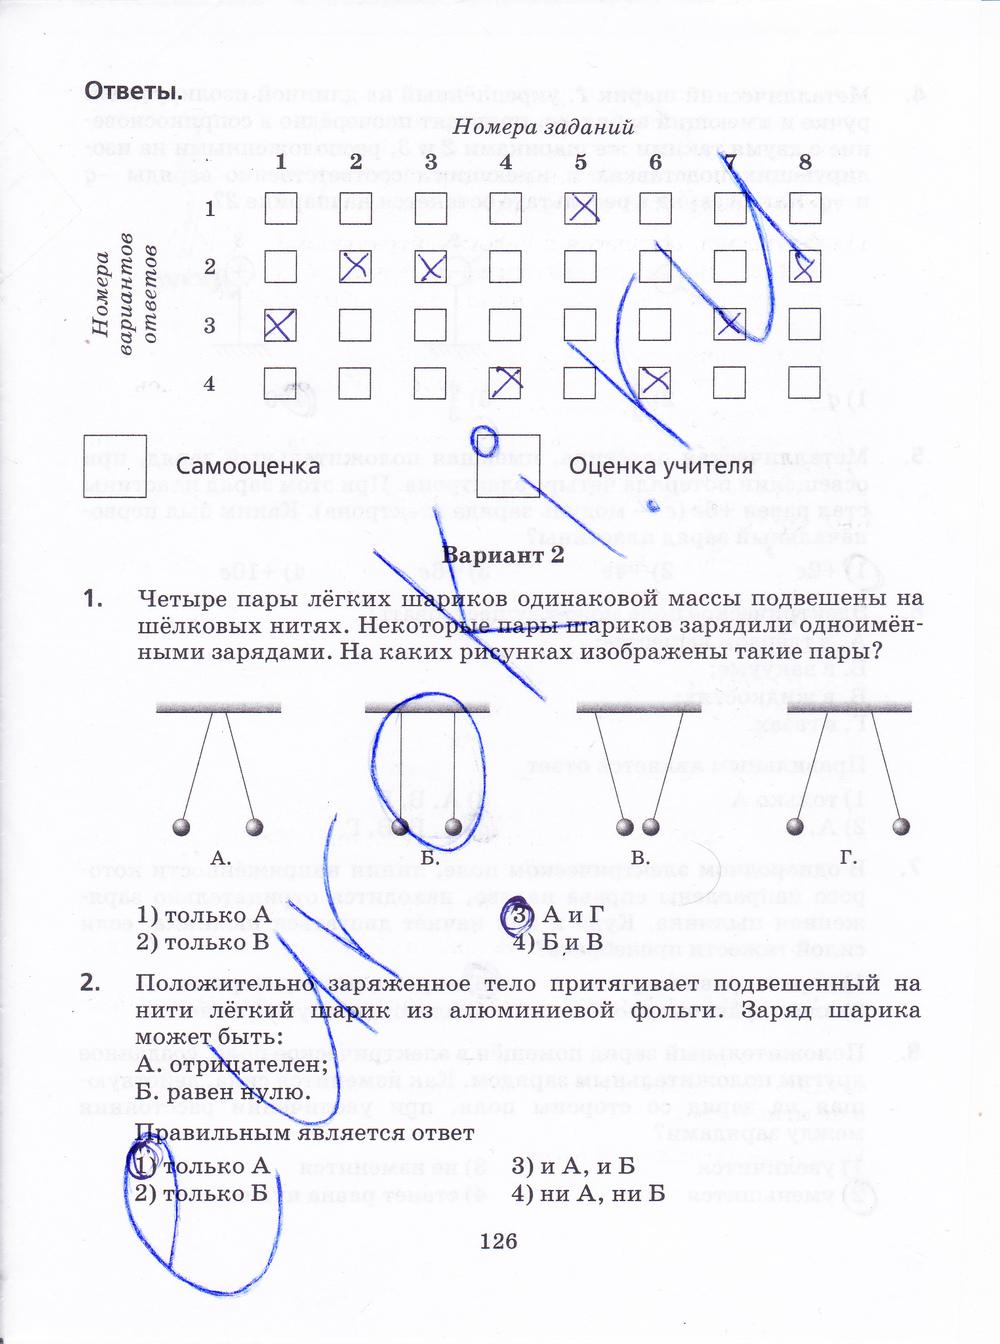 гдз по физике за 8 класс пурышева 2018 годзадания 4(1)